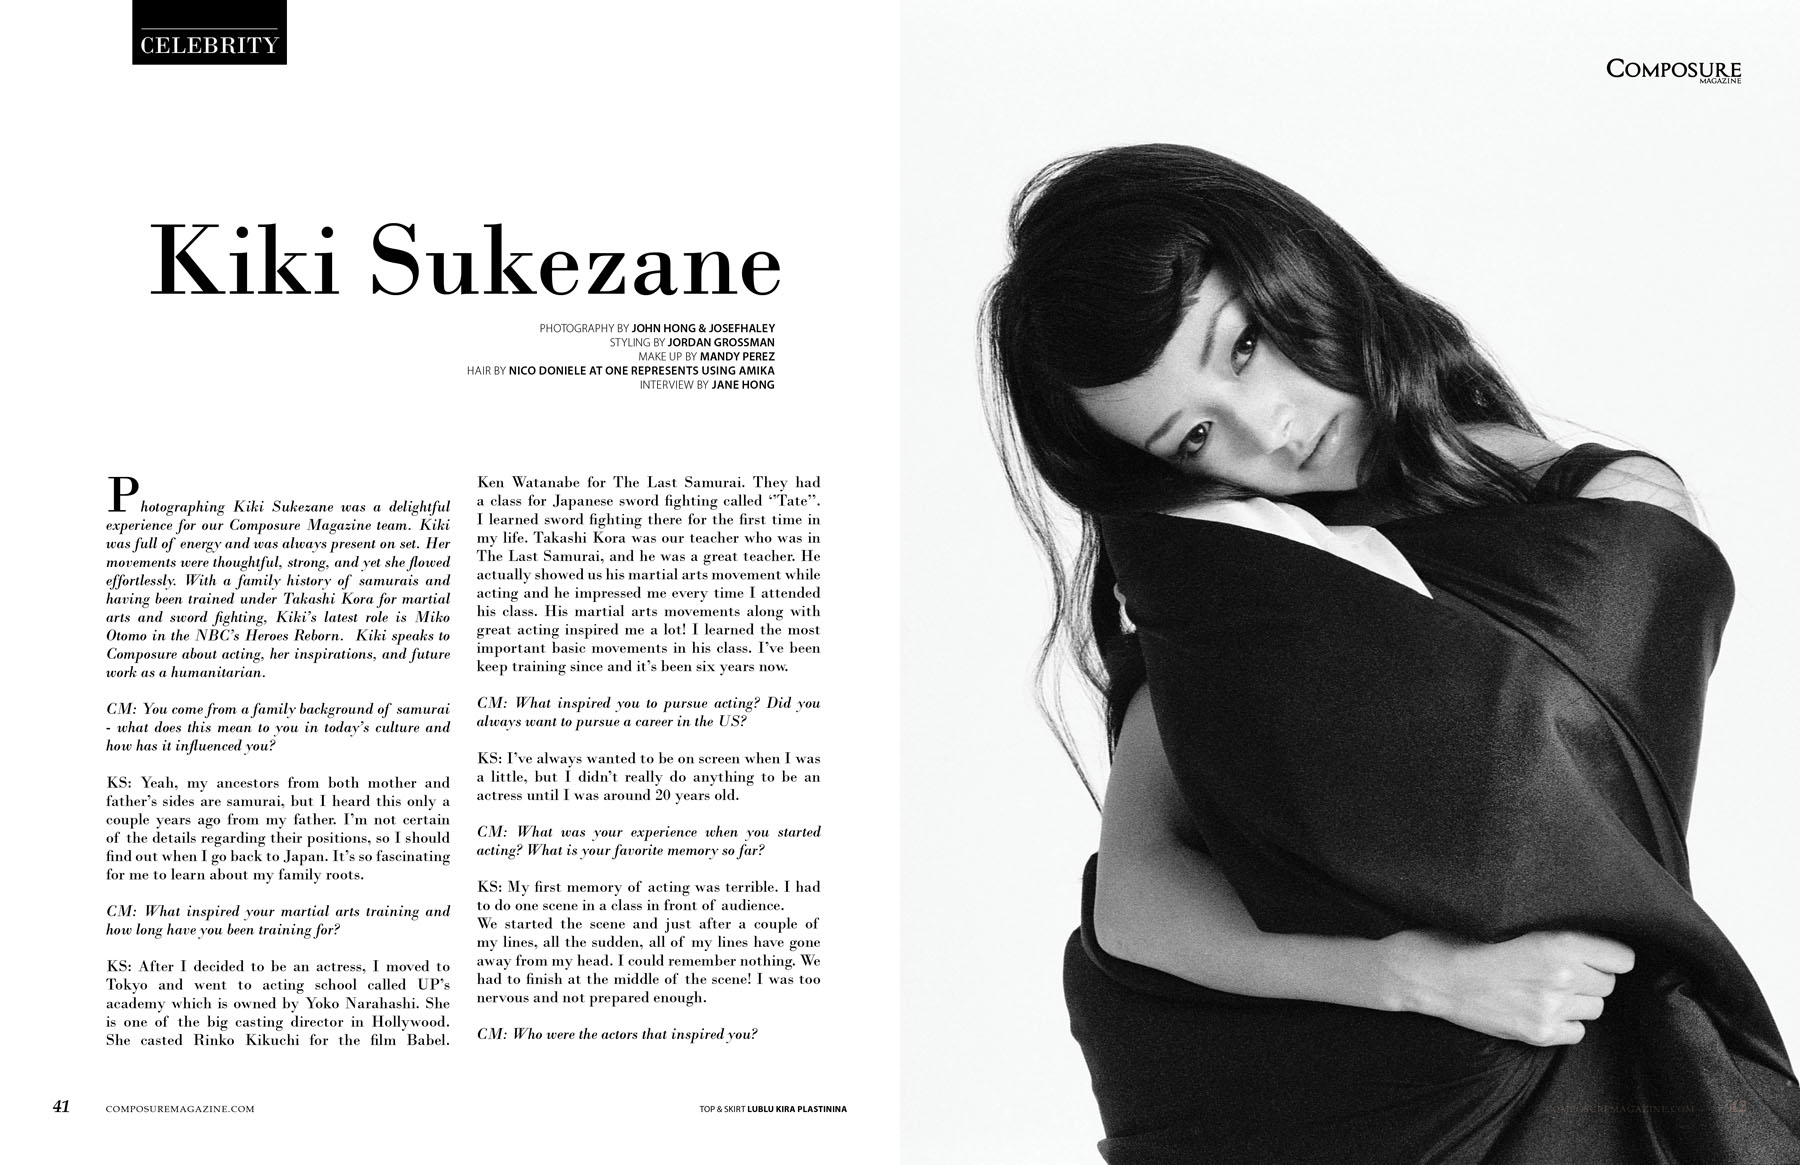 Kiki Sukezane